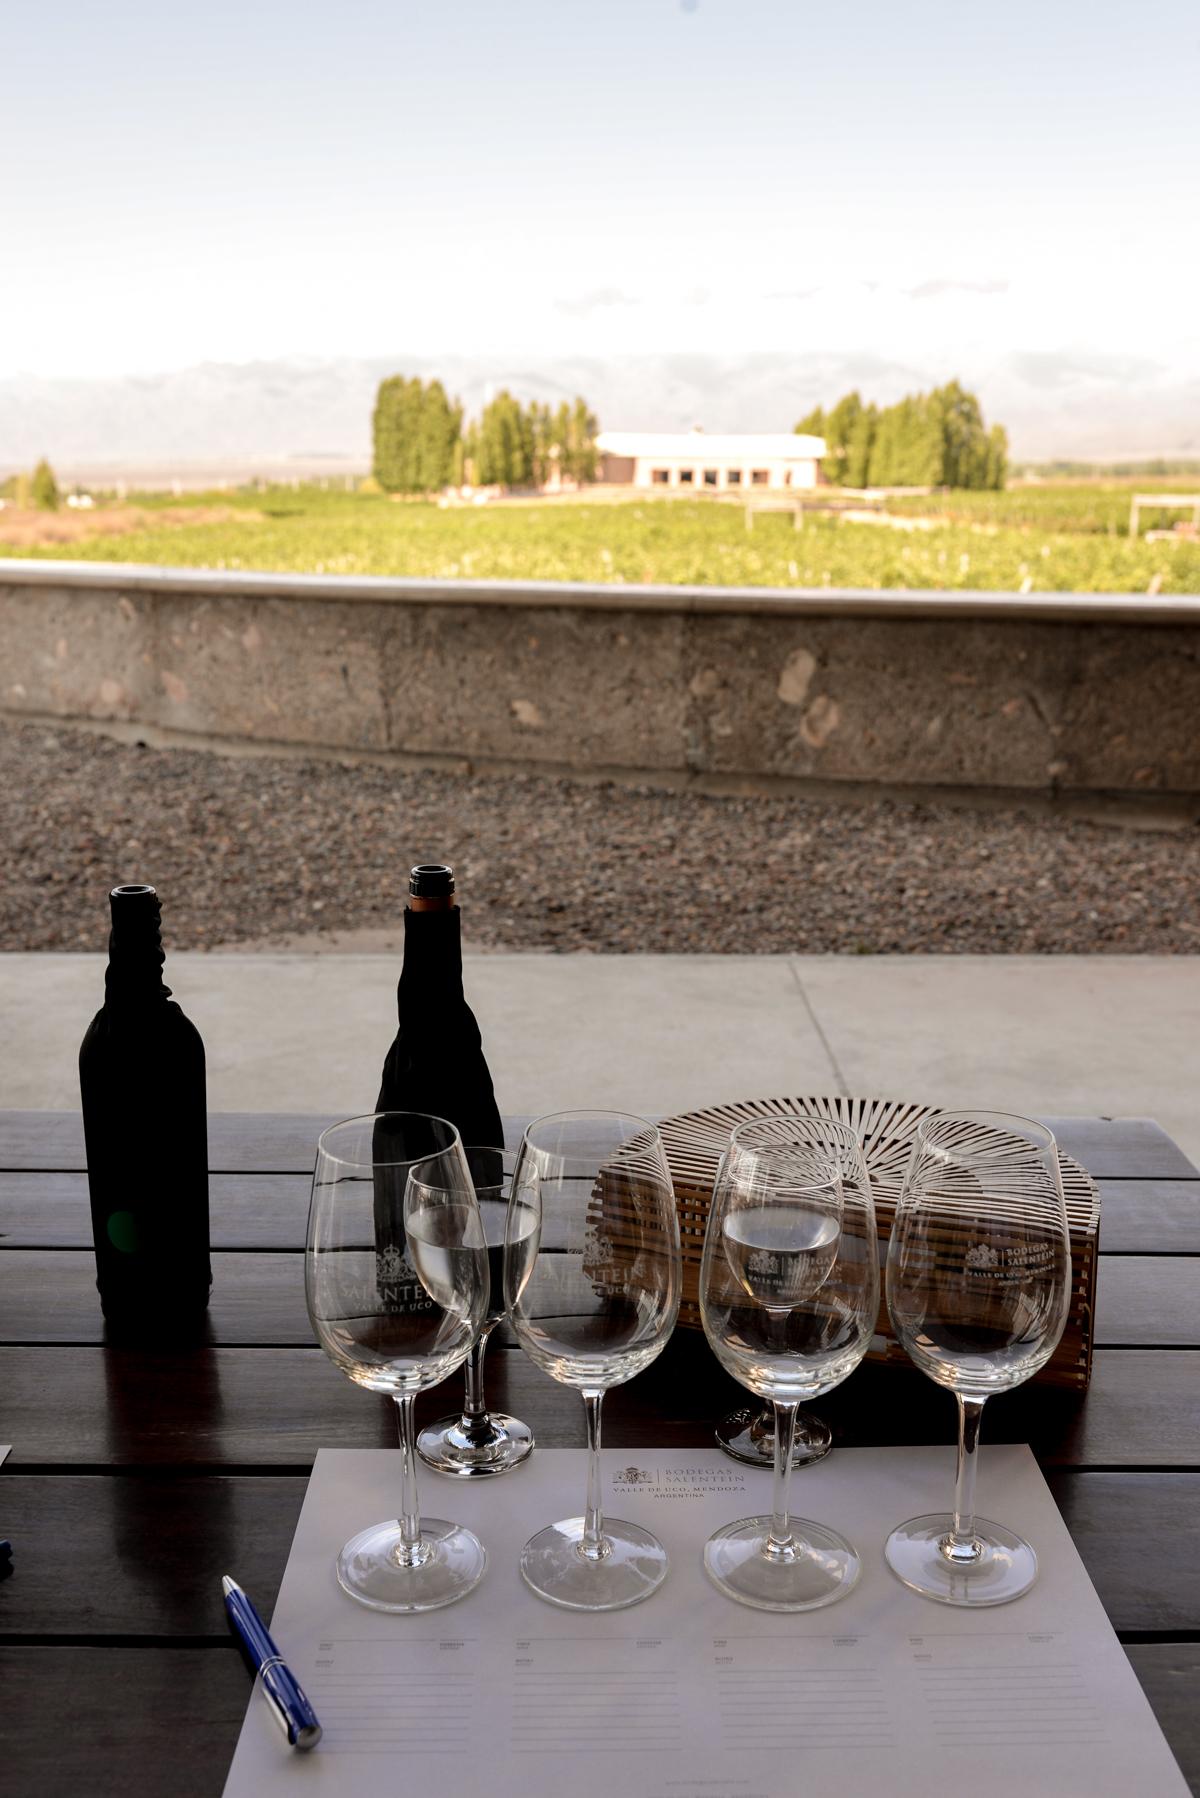 Stacie-Flinner-Best-Mendoza-Winery-28